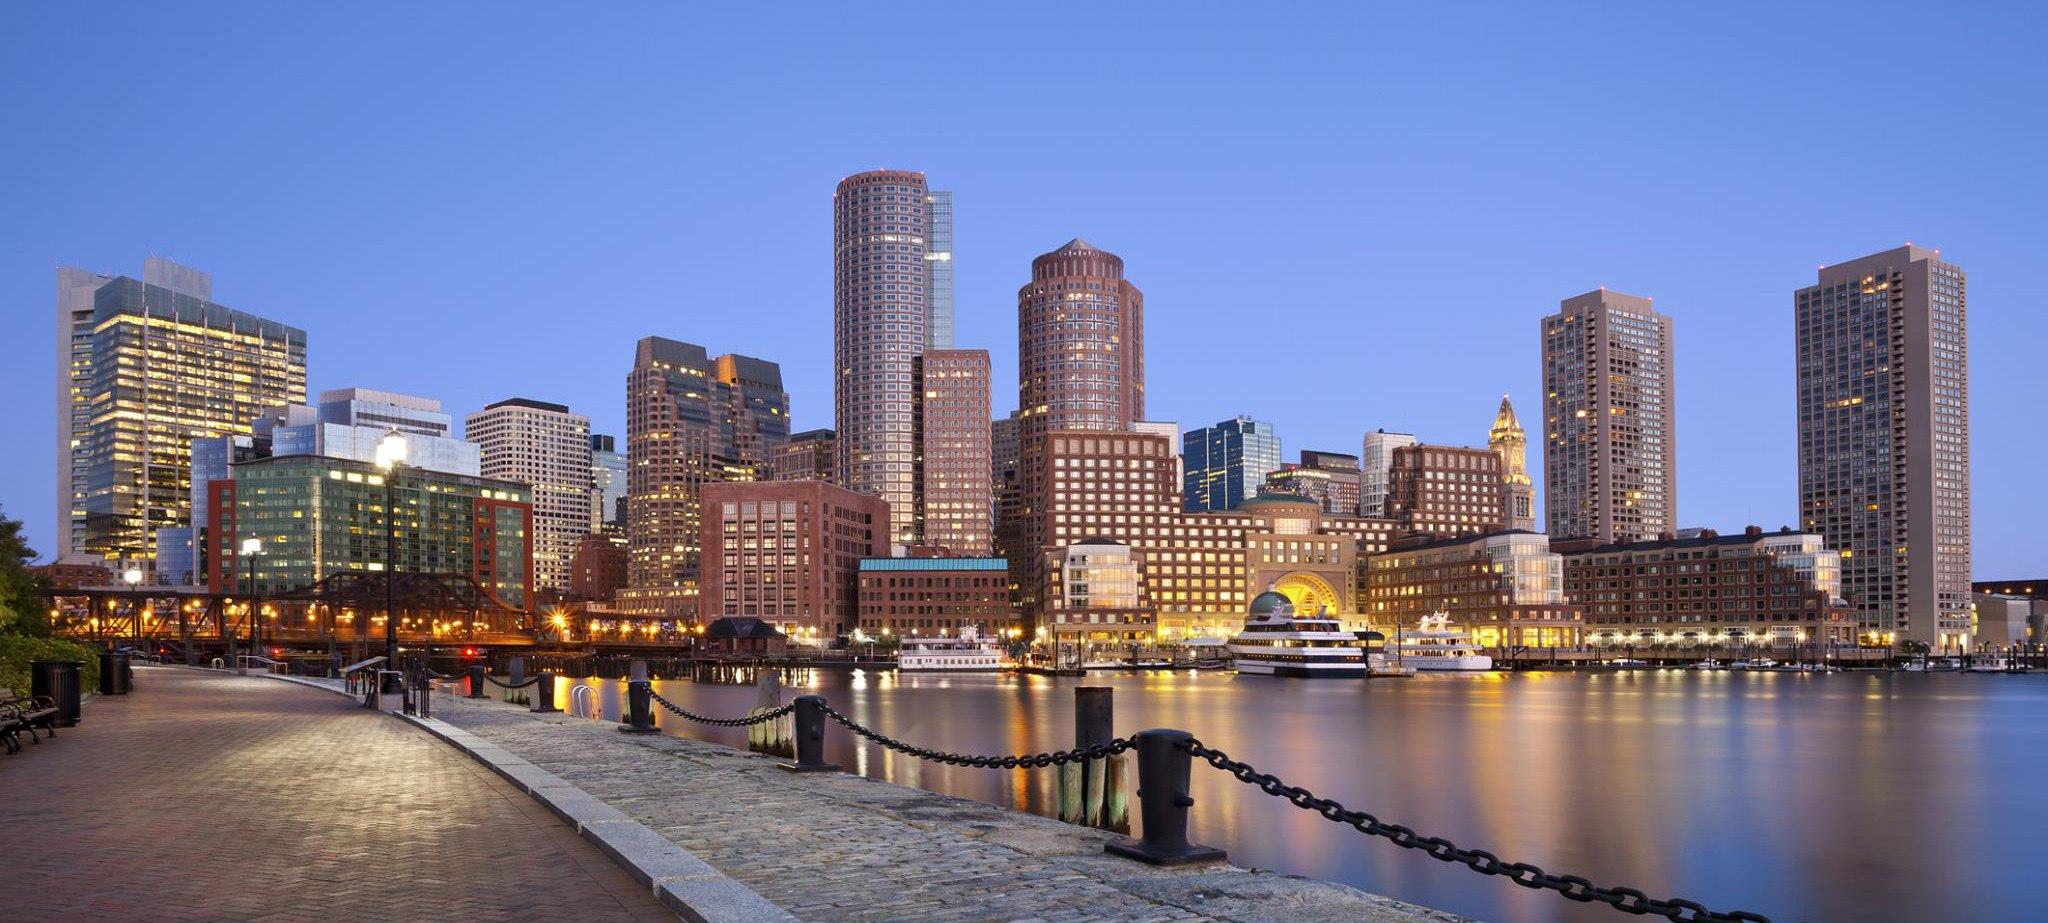 Boston skyline photo